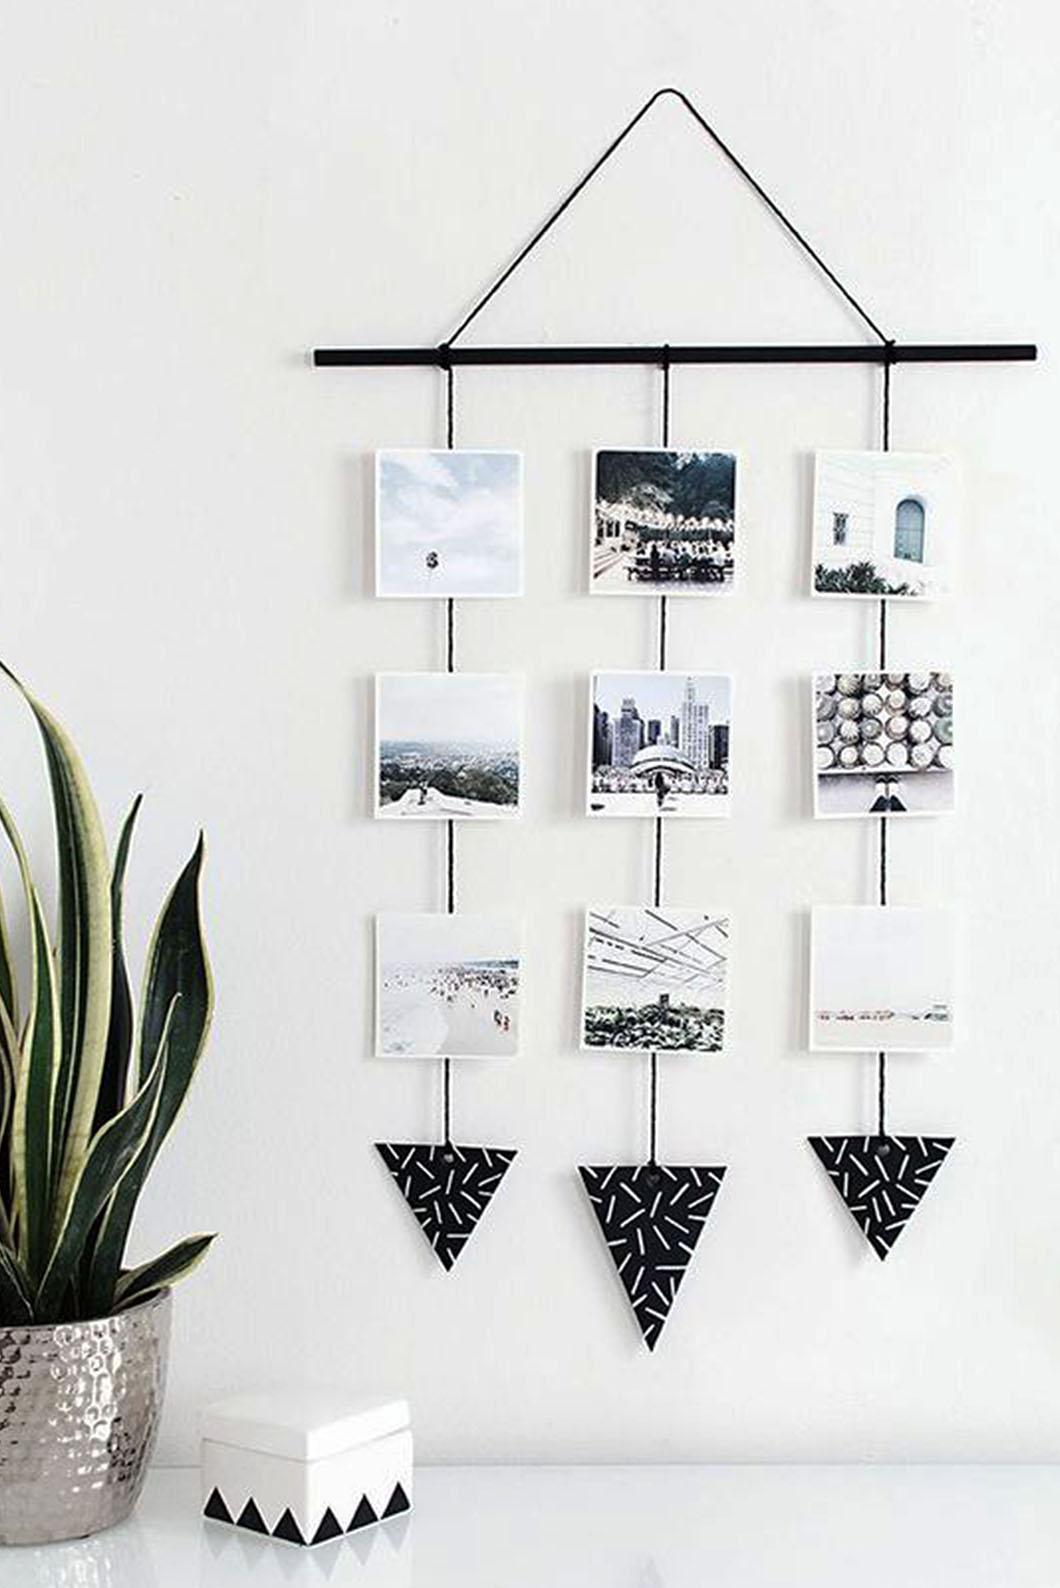 Minimalist wall decor ideas that can fit anywhere for Minimalist wall art ideas